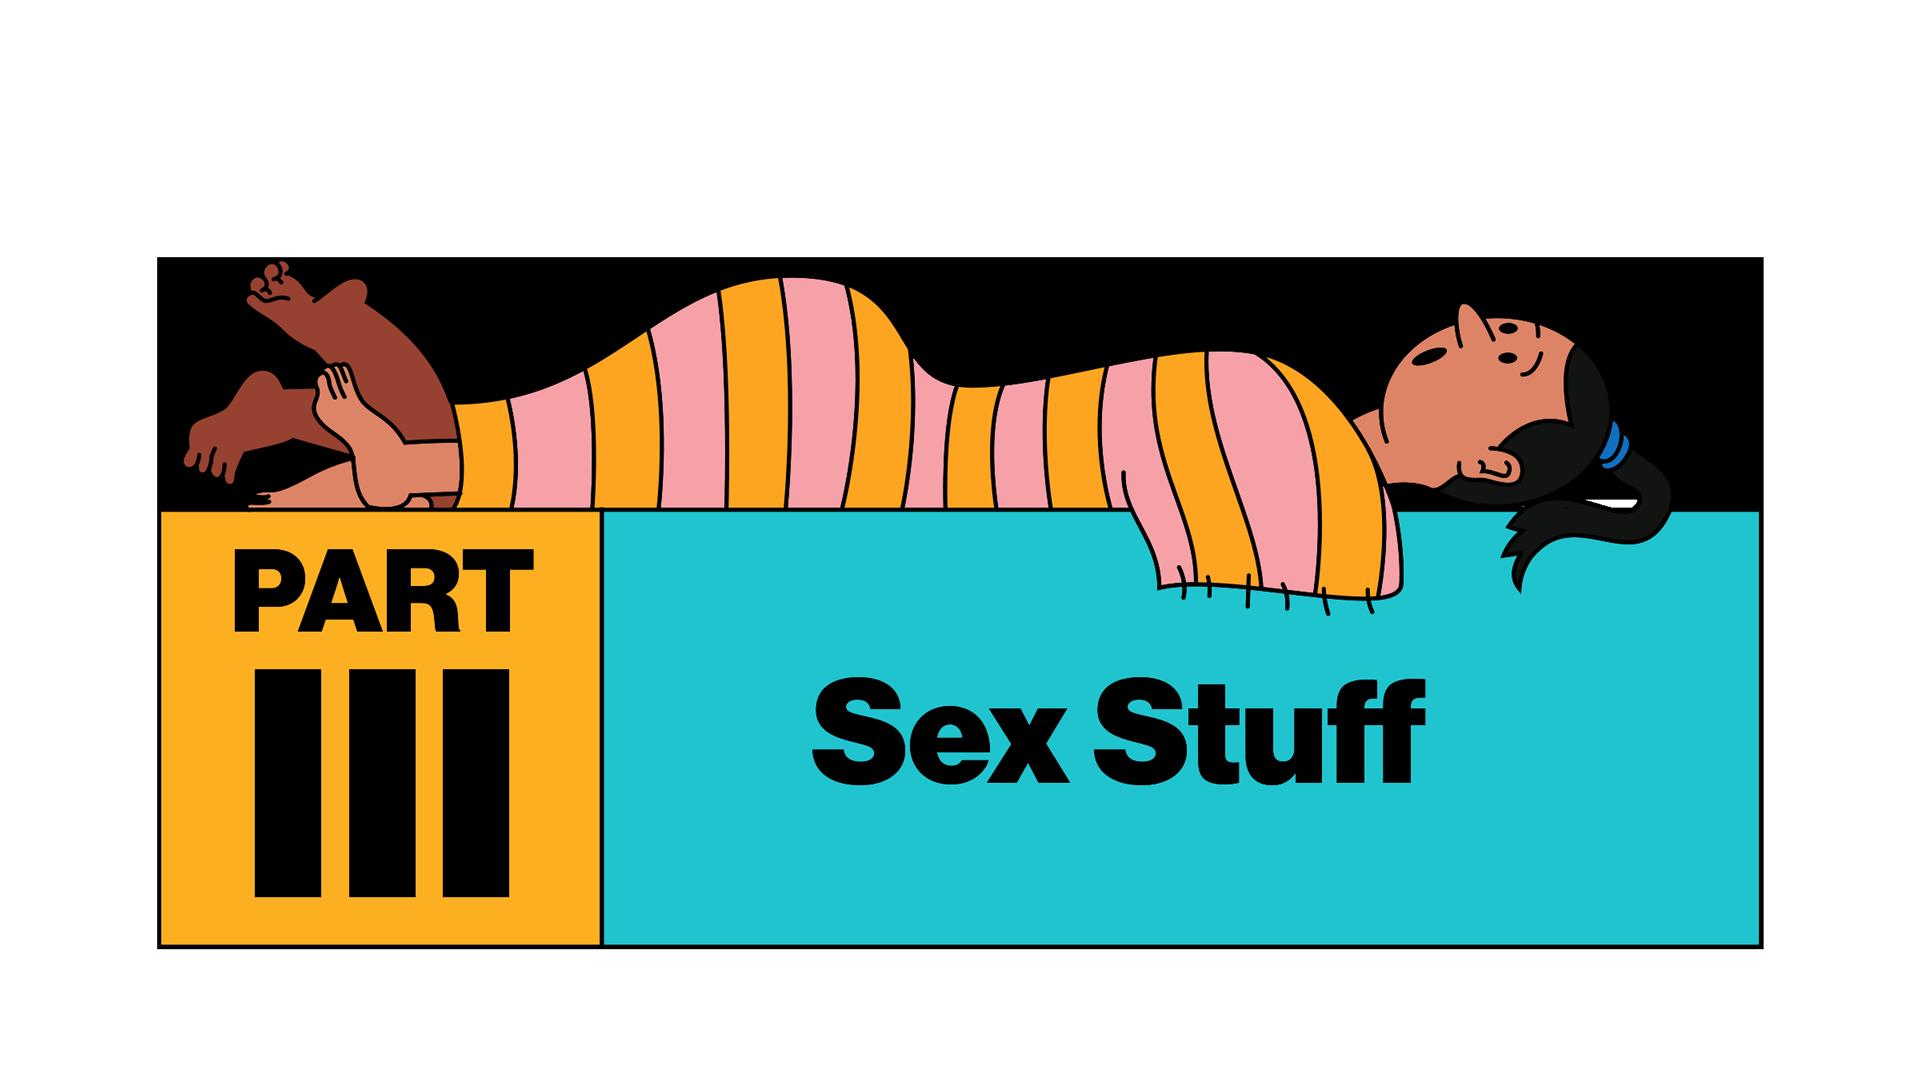 Part III: Sex Stuff